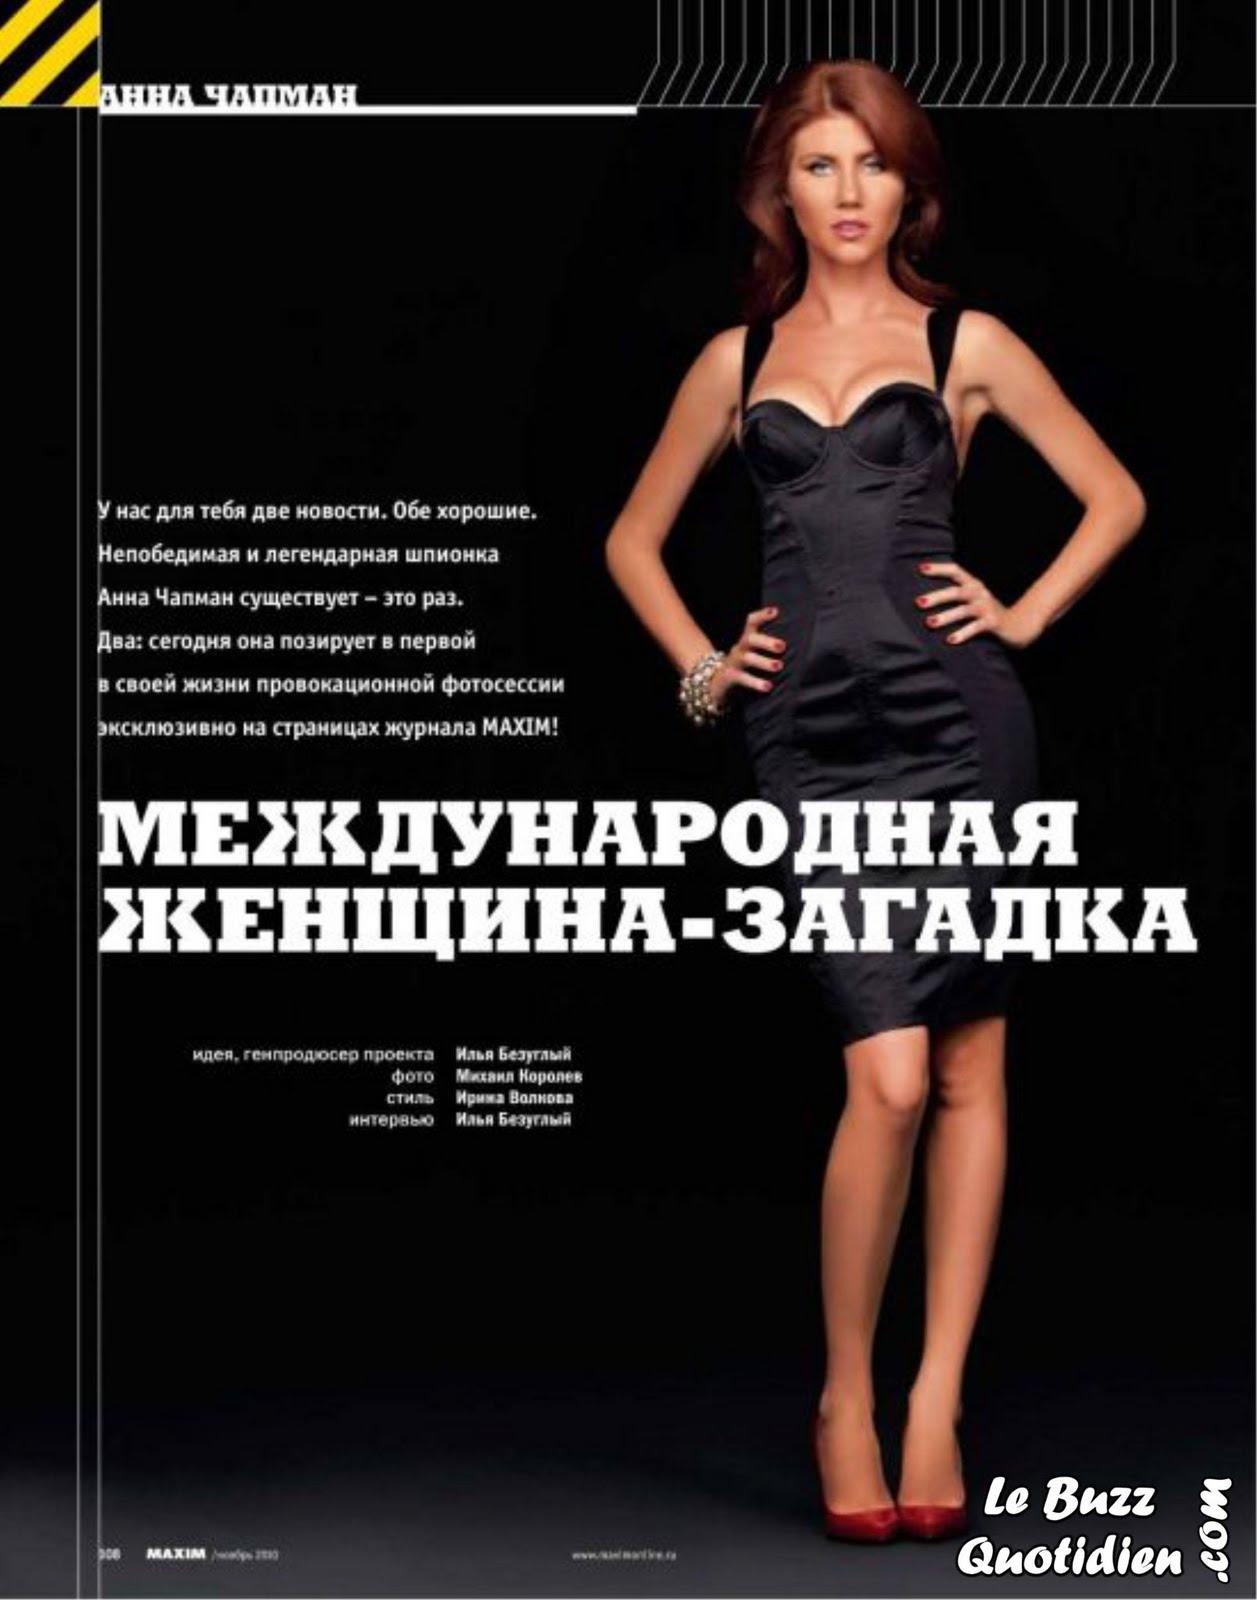 Anna Chapman Maxim